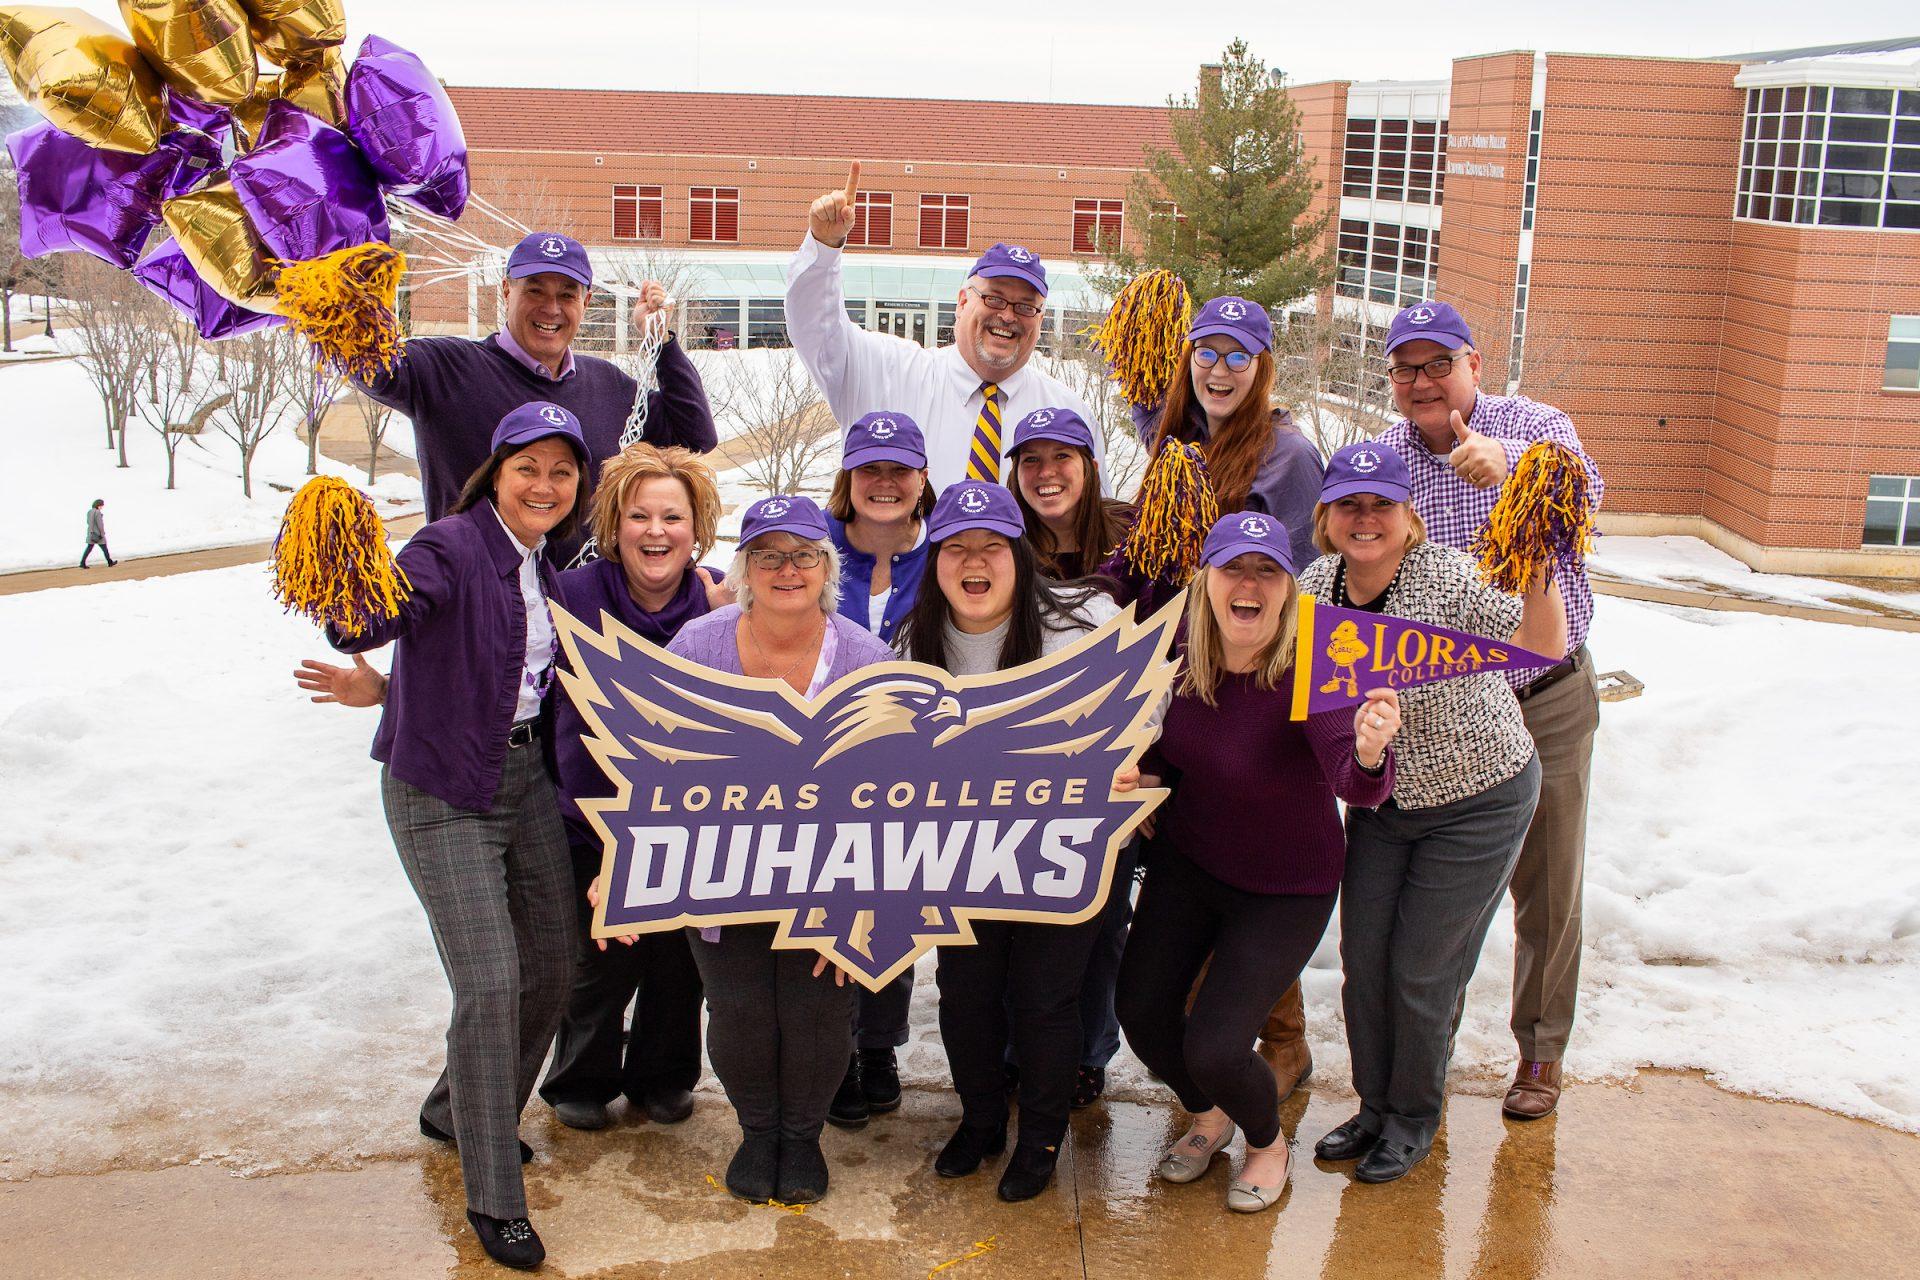 Celebrate Loras College Duhawk Day